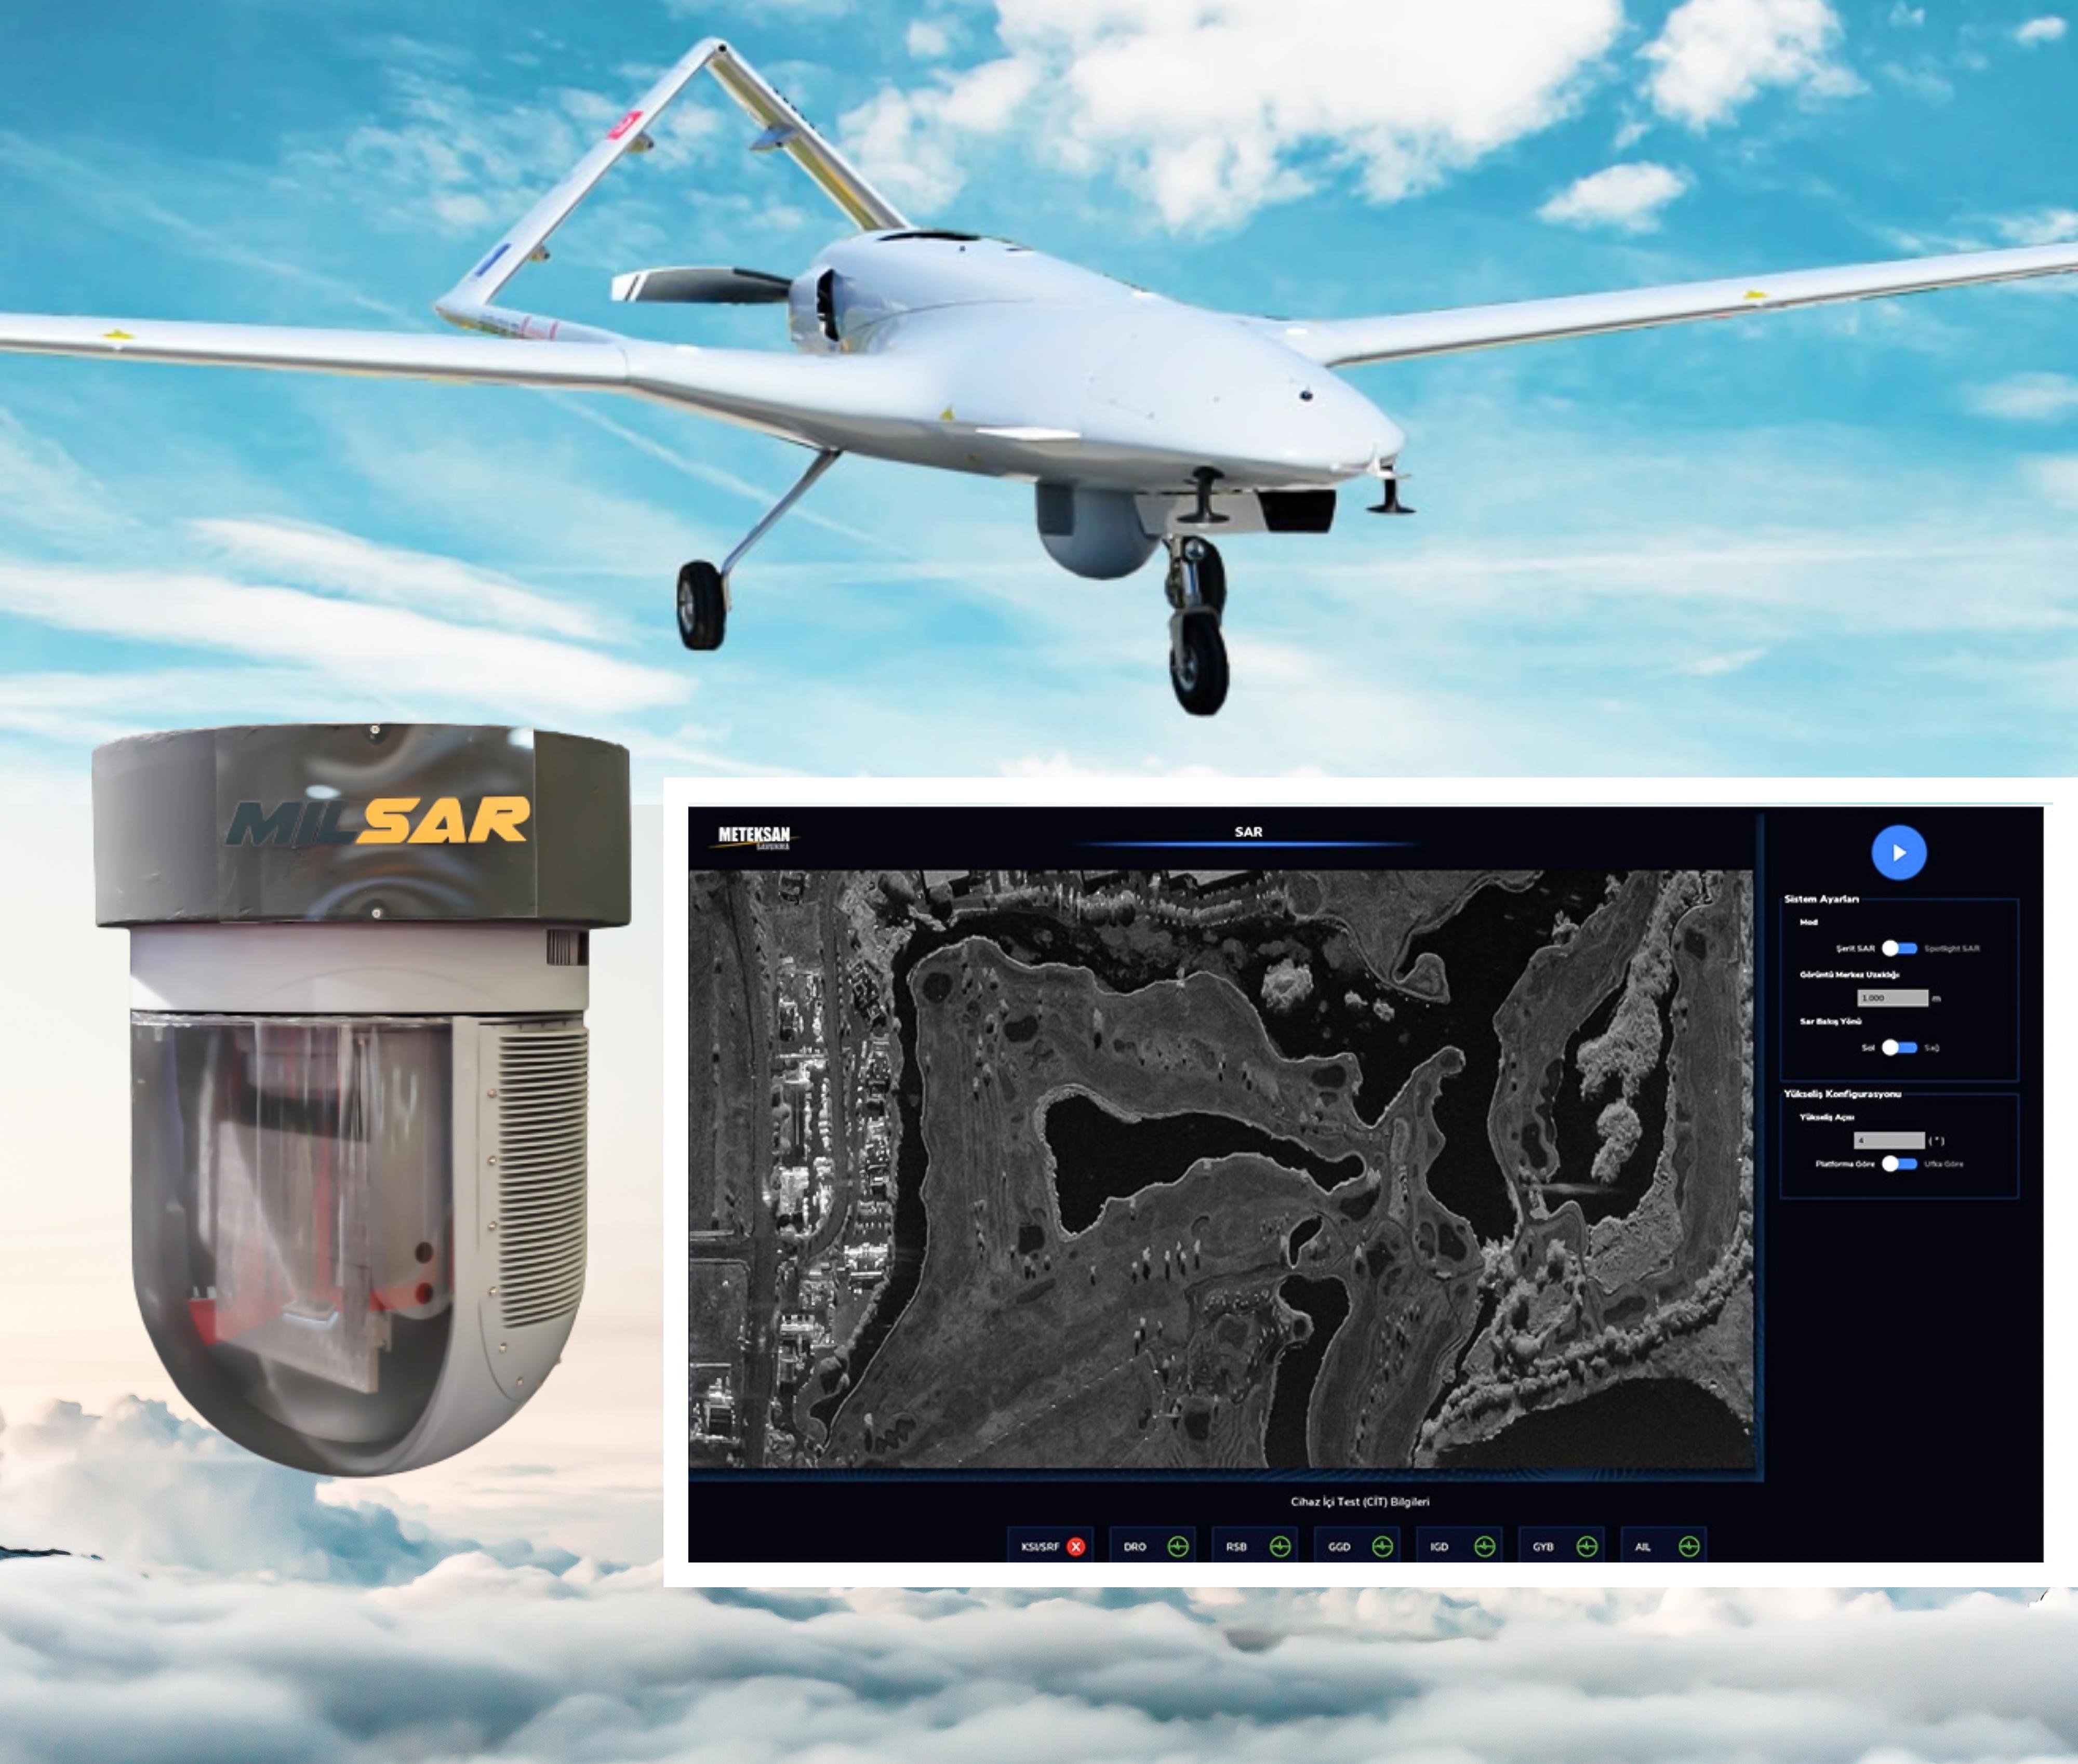 Meteksan Defence MILSAR SAR/GMTI Radar Provides Outstanding Capabilities to Tactical UAVs